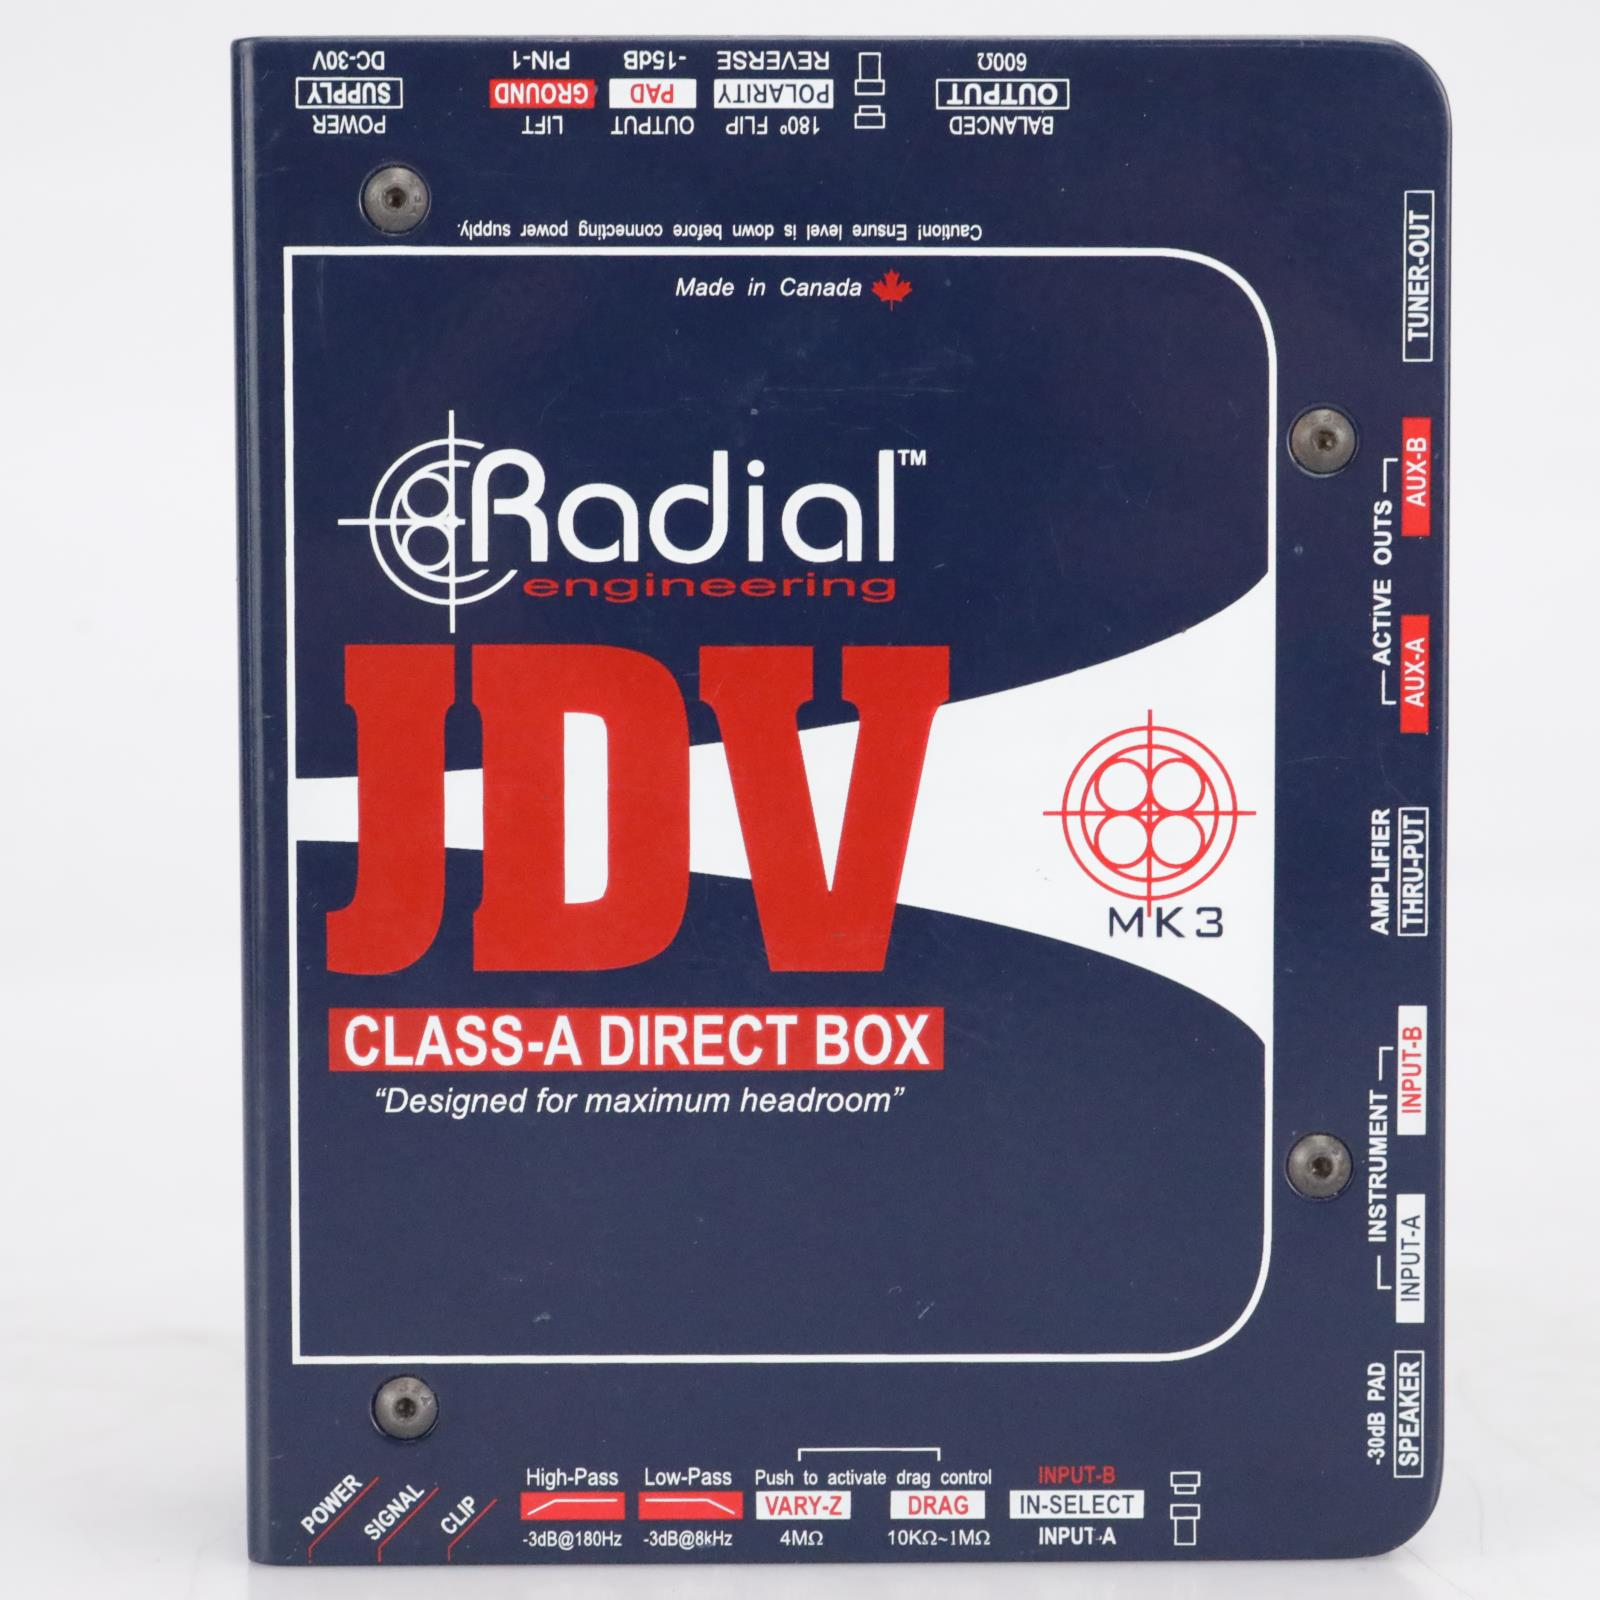 Radial Engineering JDV MK3 Class-A Direct Box #41886